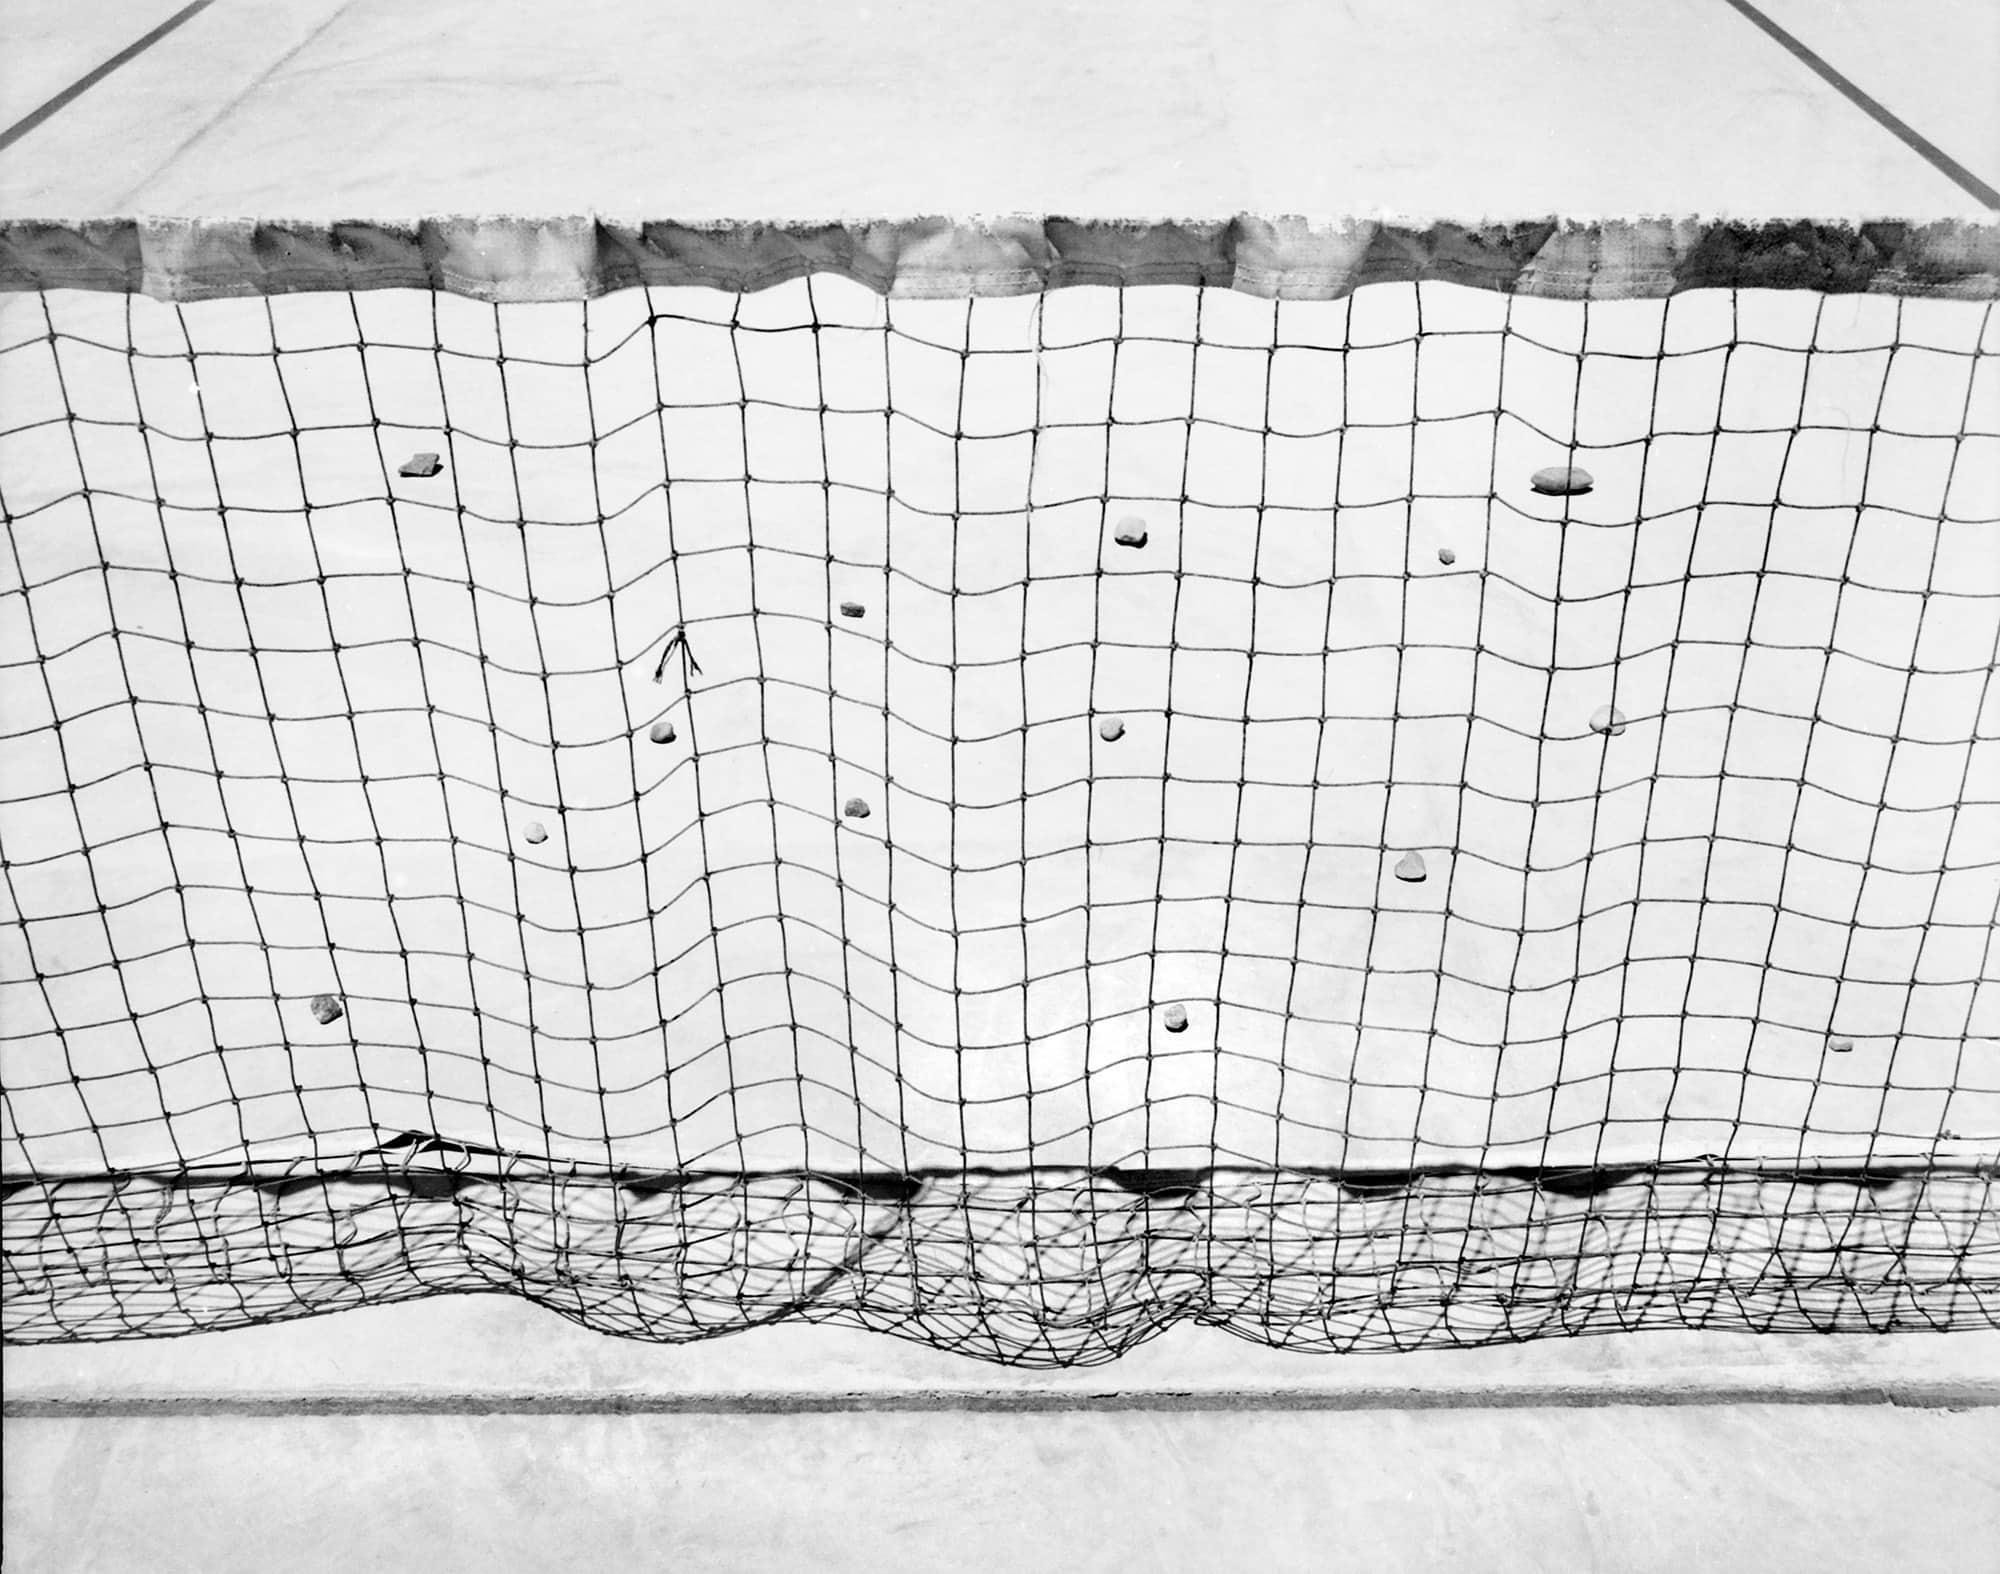 Tennis Court, Death Valley, California, USA, 1978